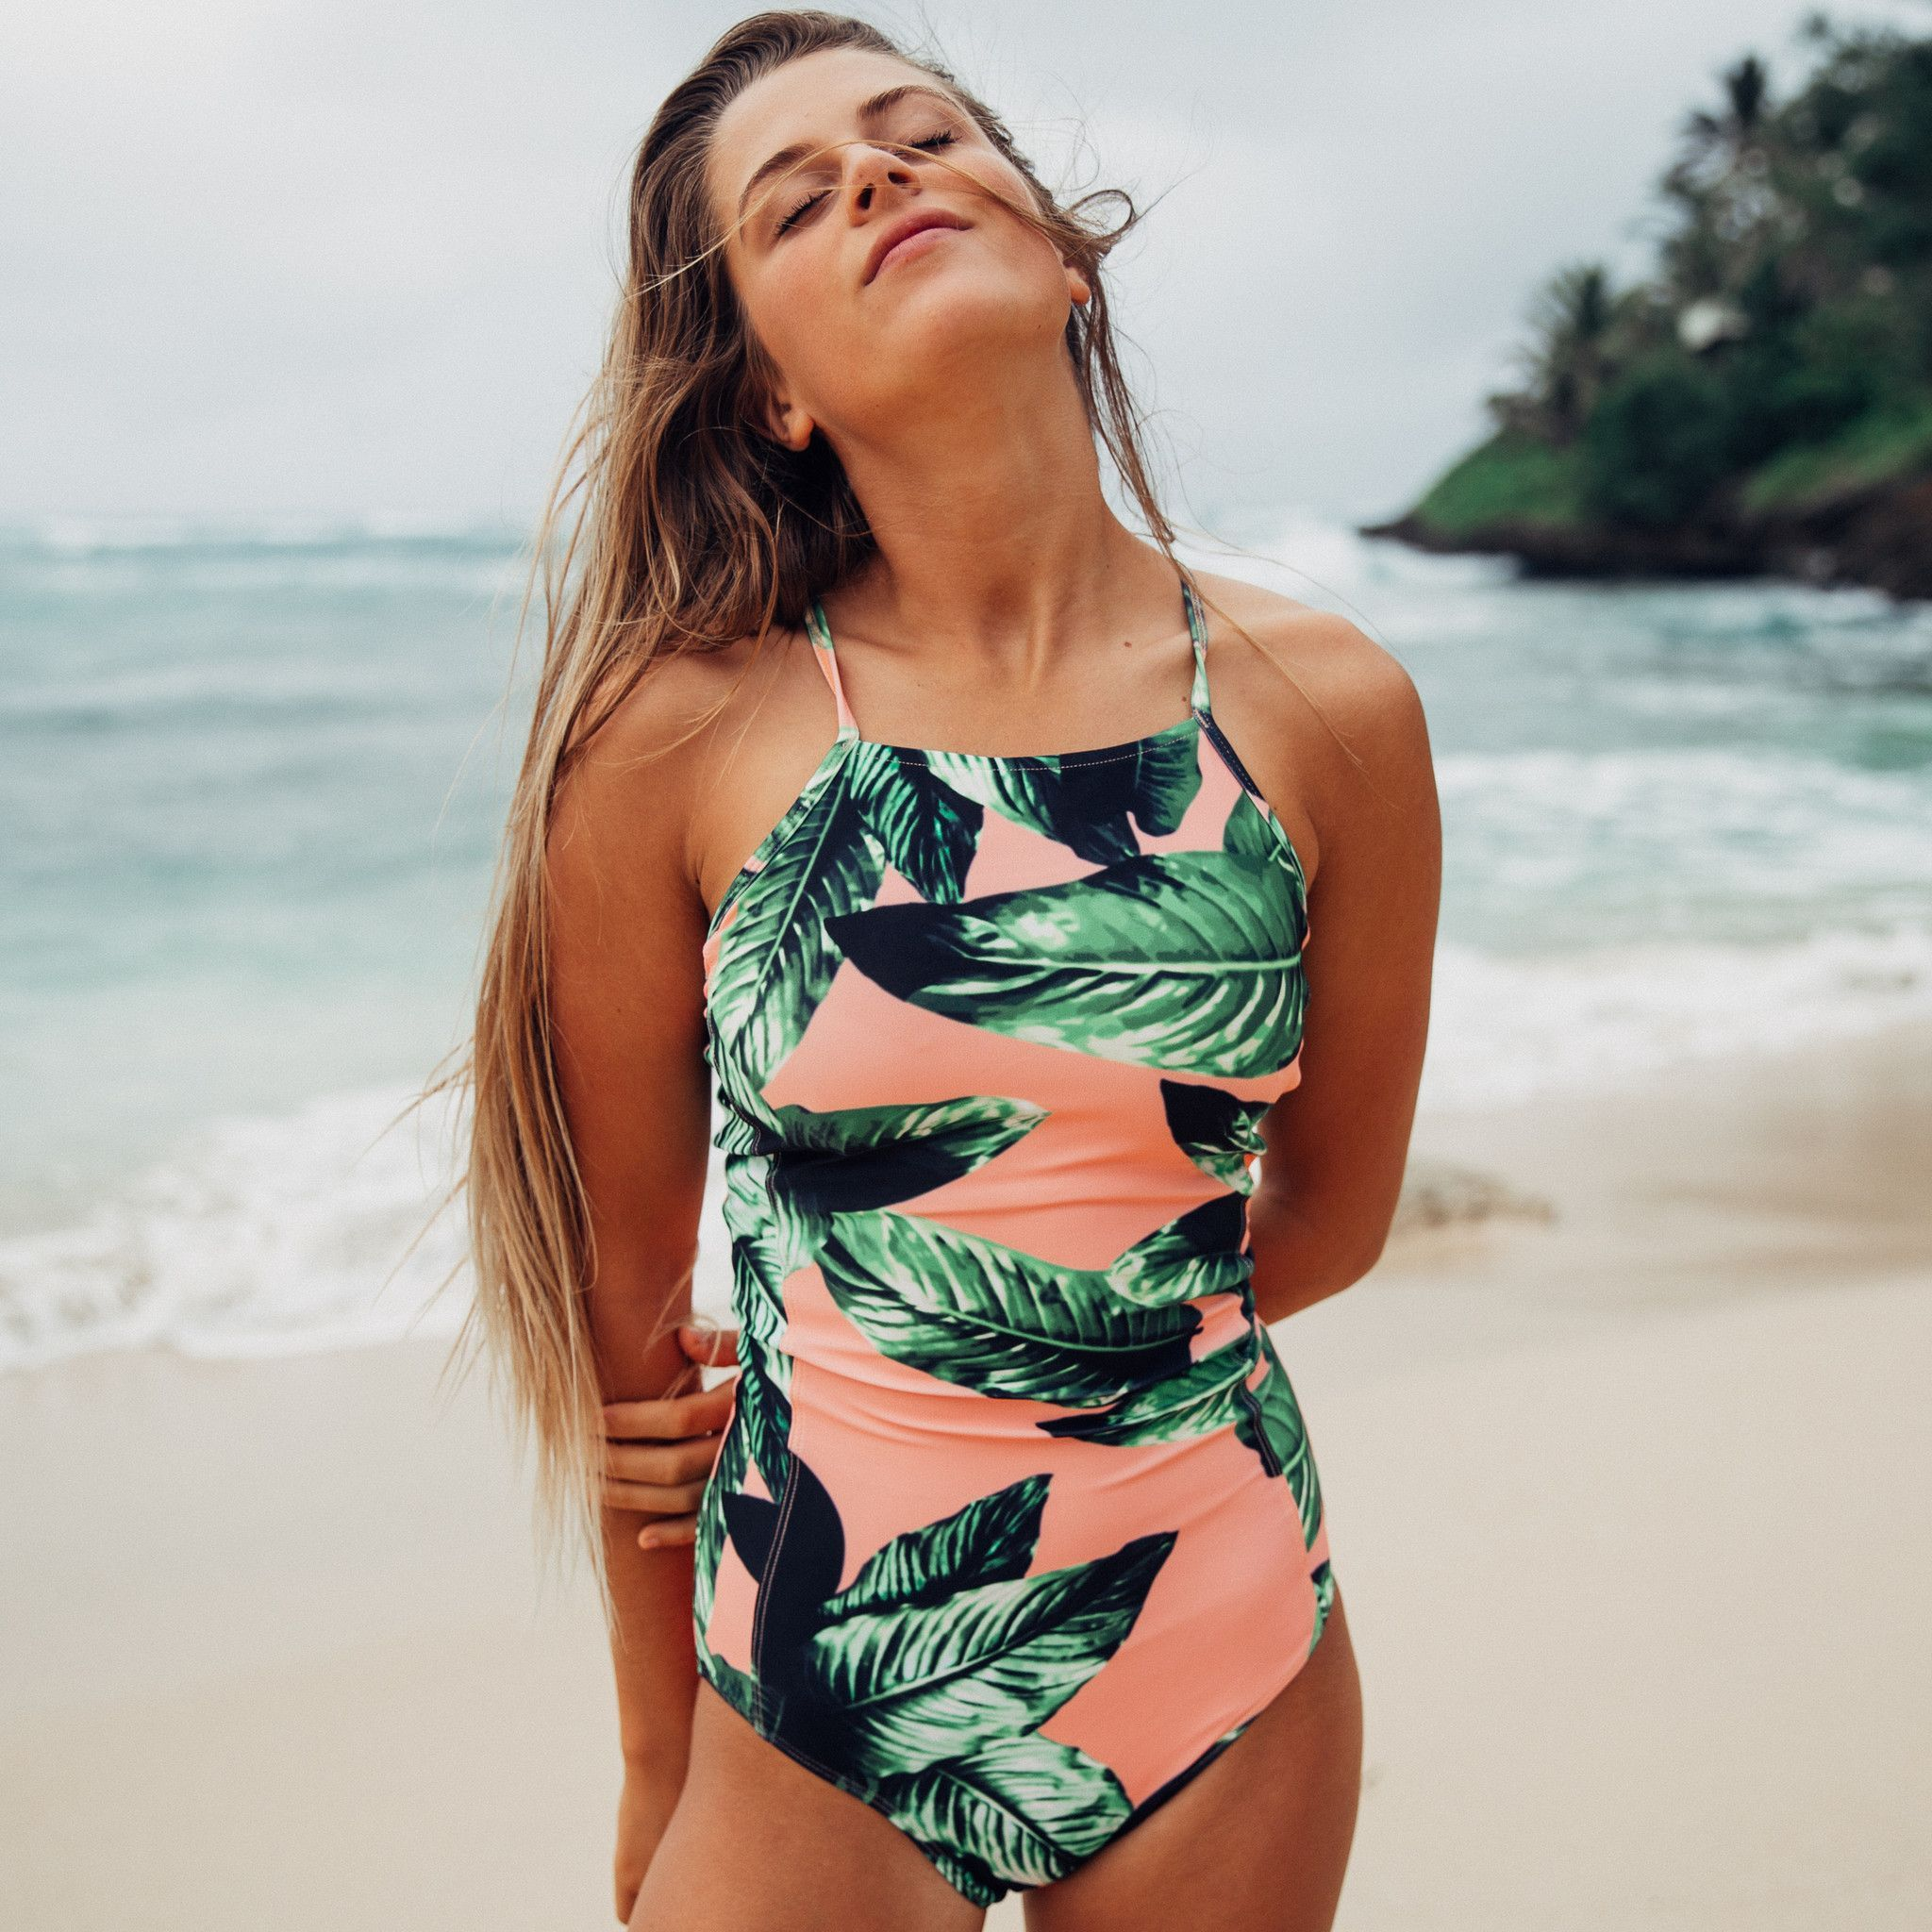 Womens One Piece Bikini Monokini Padded Swimwear Swimsuit Tropical Bathing Suit